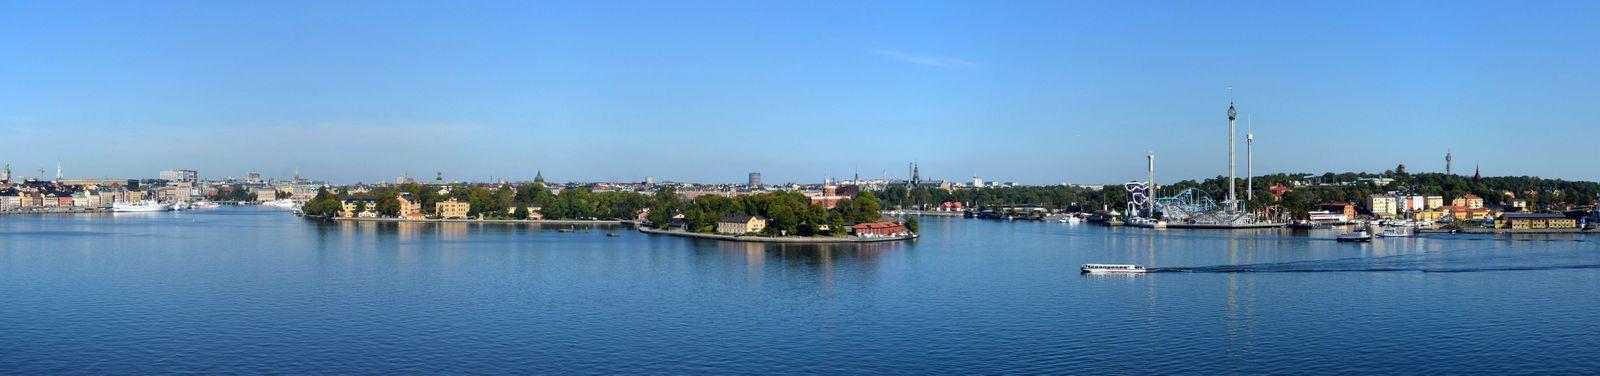 stockholm-panorama.jpg